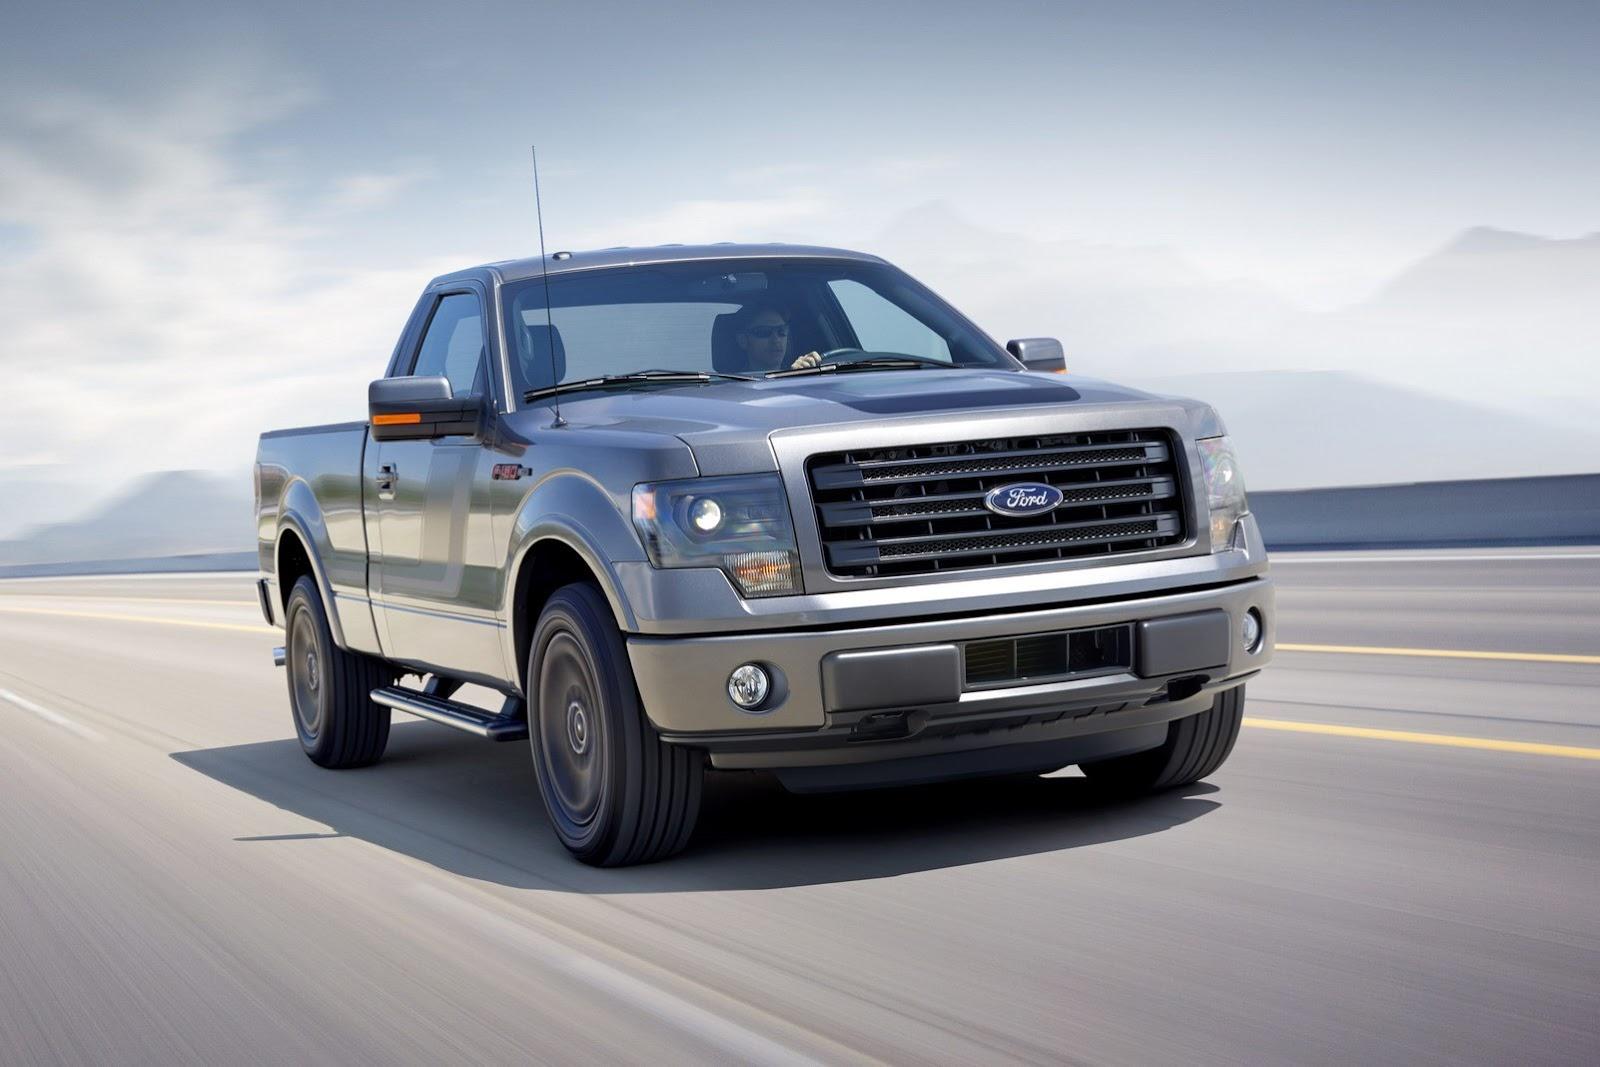 F 150 Tremor >> 2014 Ford F-150 Tremor Revealed - autoevolution